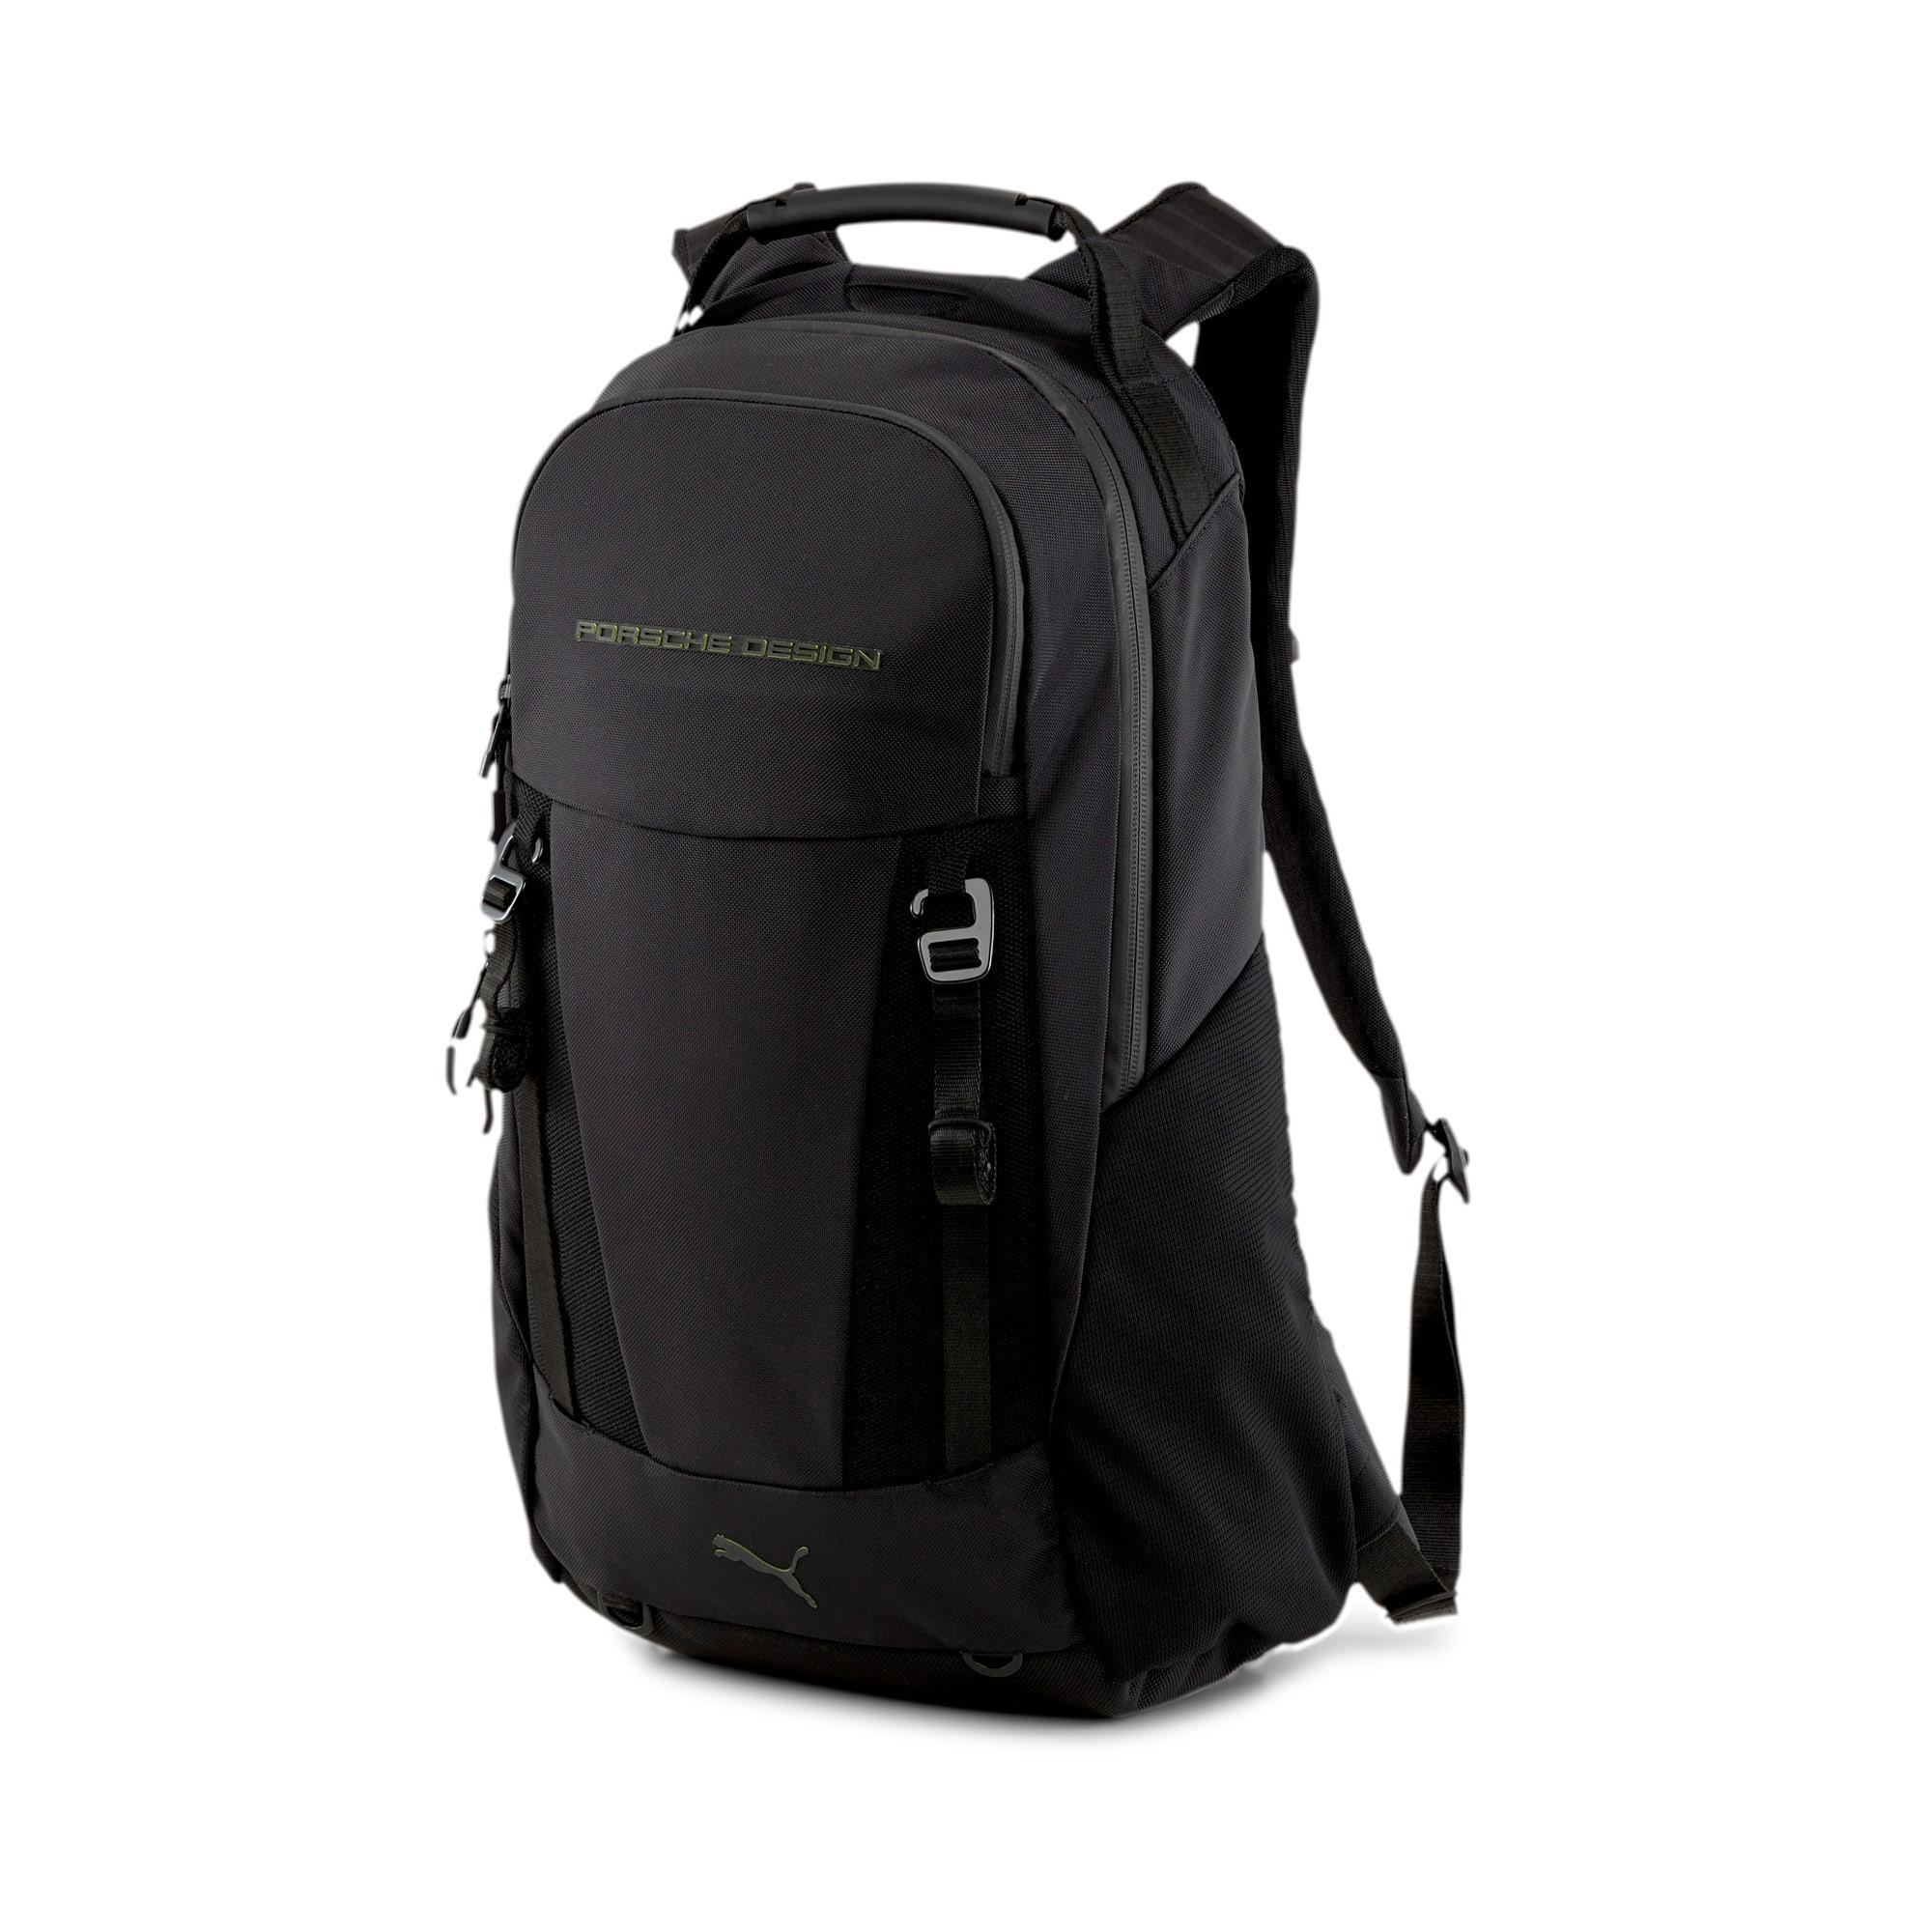 Thumbnail 1 of Porsche Design evoKNIT Backpack, Puma Black, medium